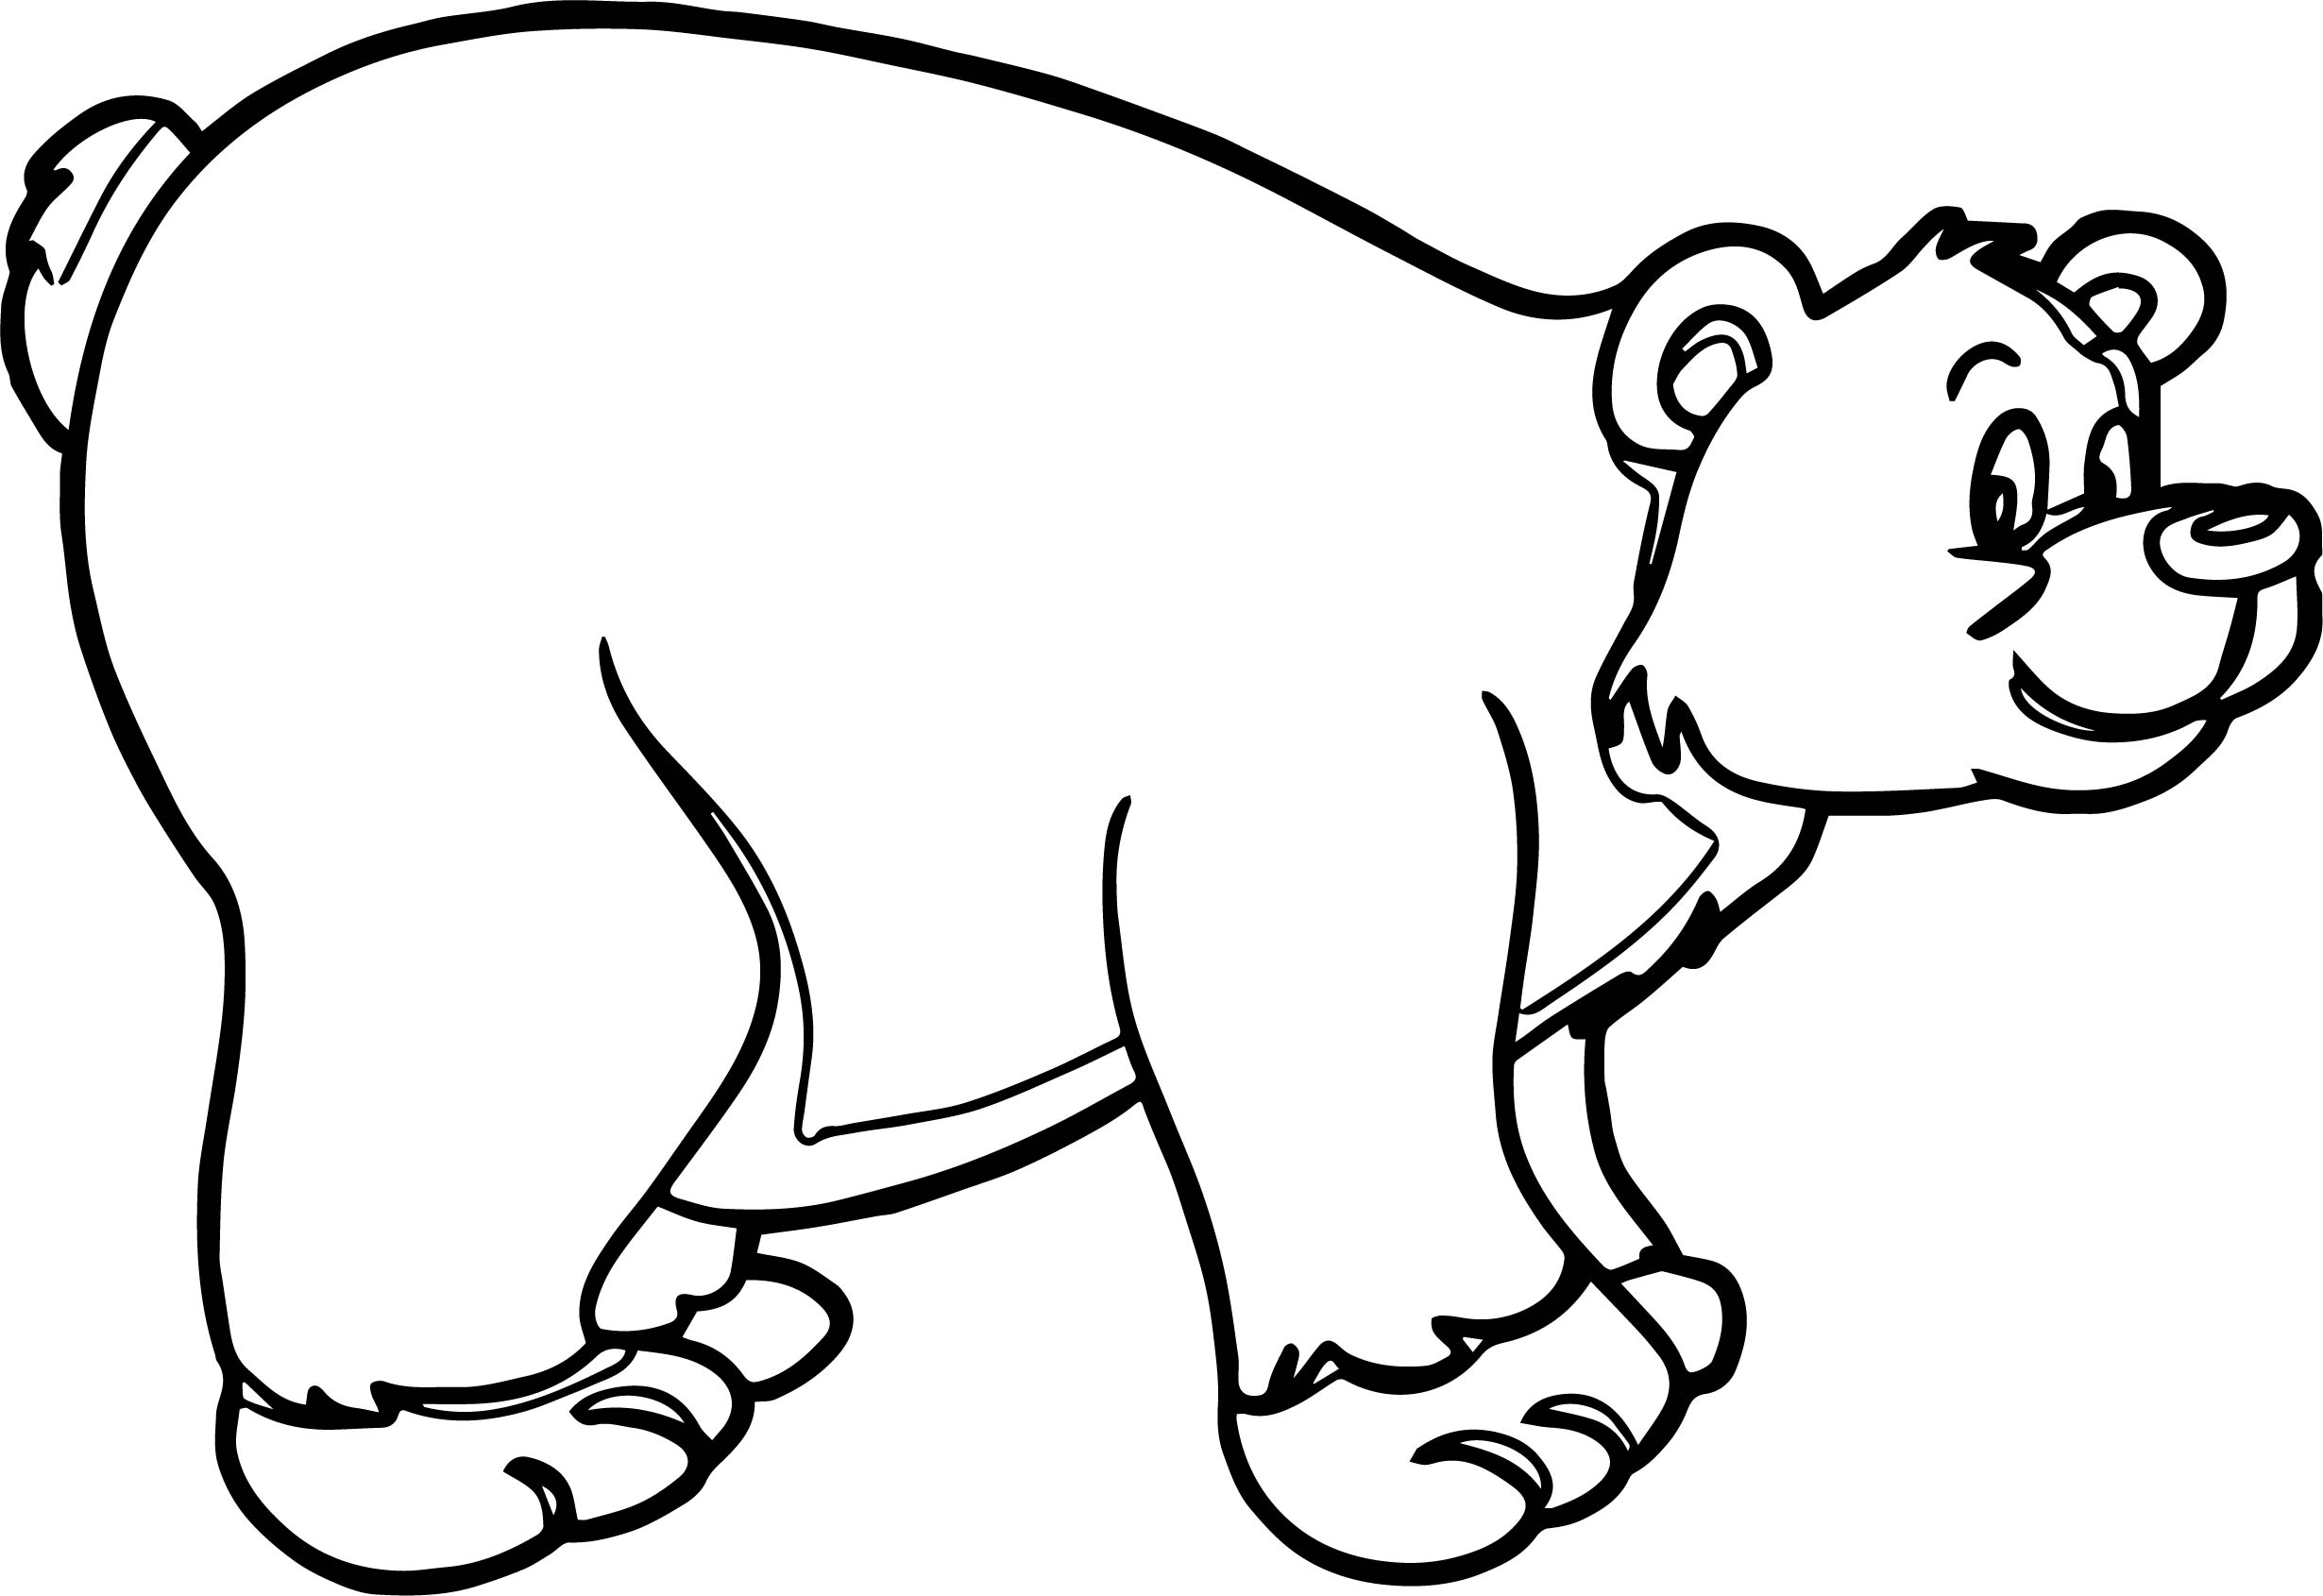 Big brown bear coloring pages ~ Big Bear Coloring Page | Wecoloringpage.com